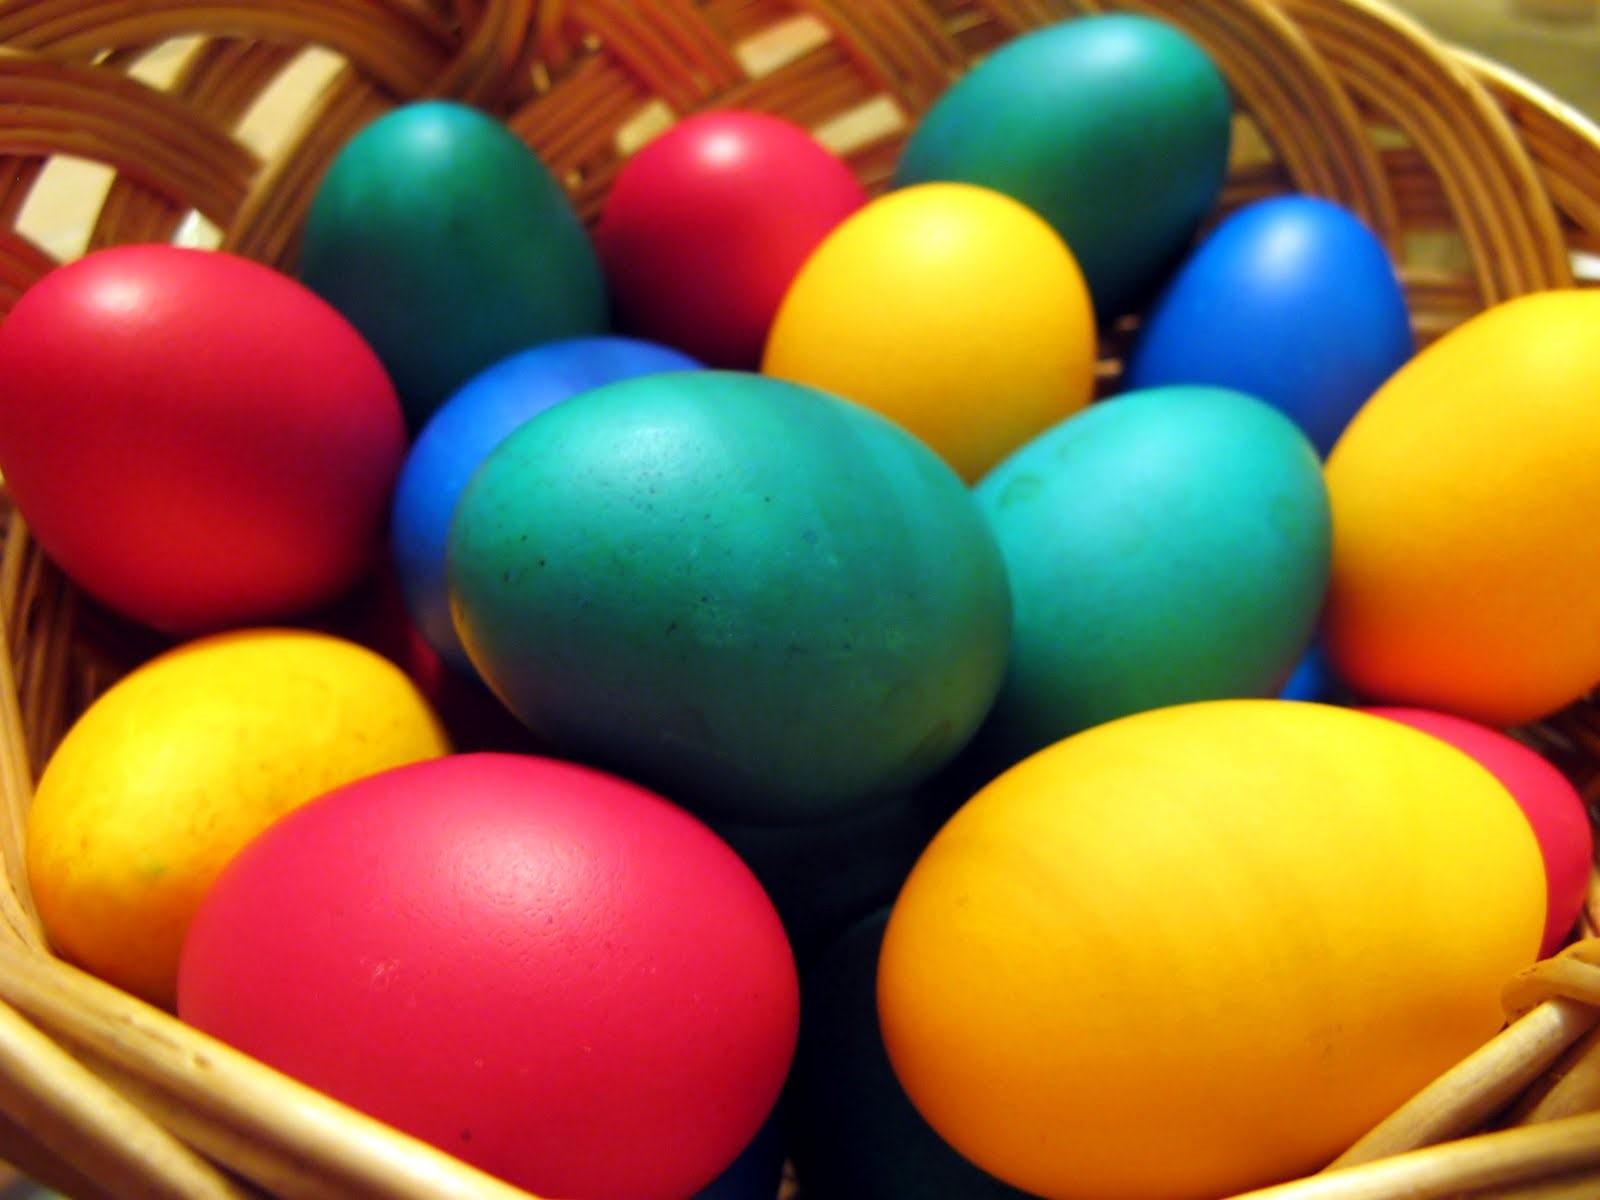 مبادله تخممرغ الوان در عید نوروز